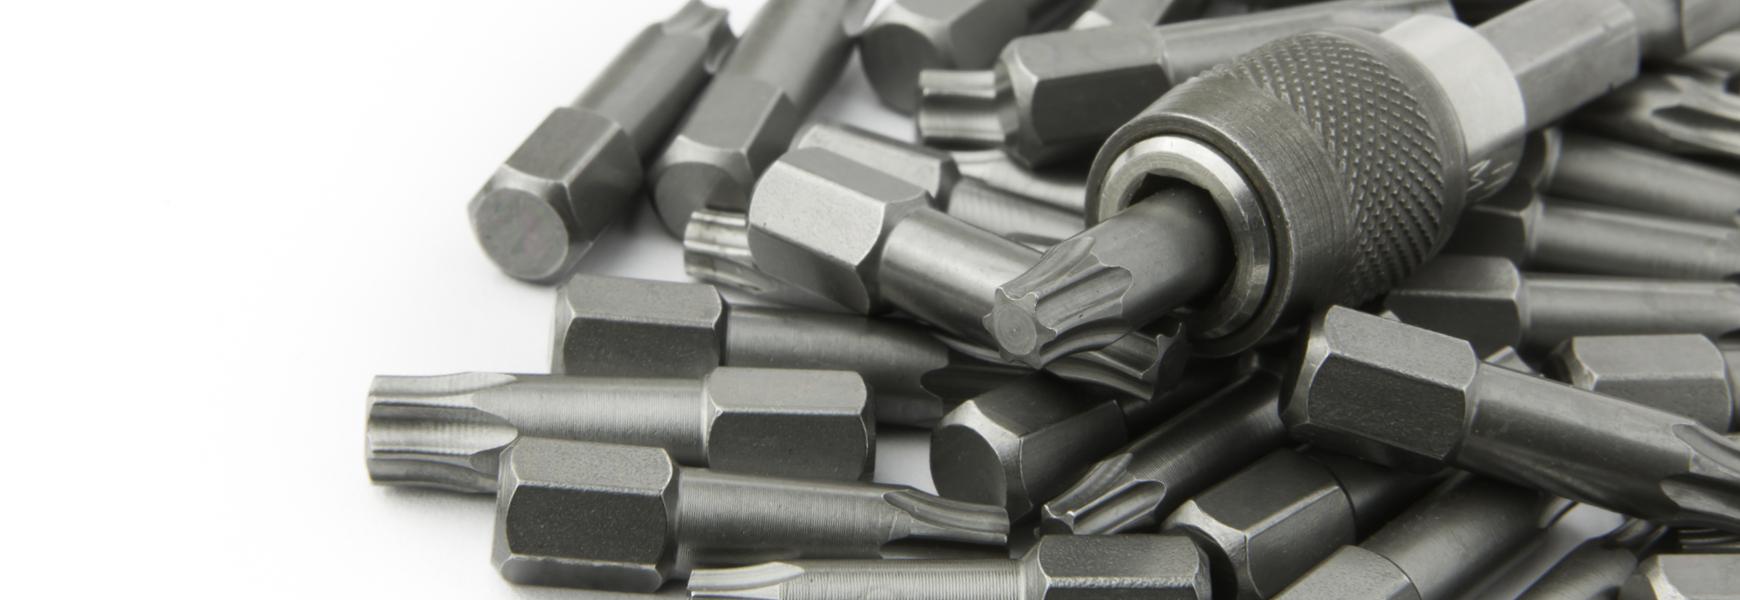 A pile of screwdriver bits